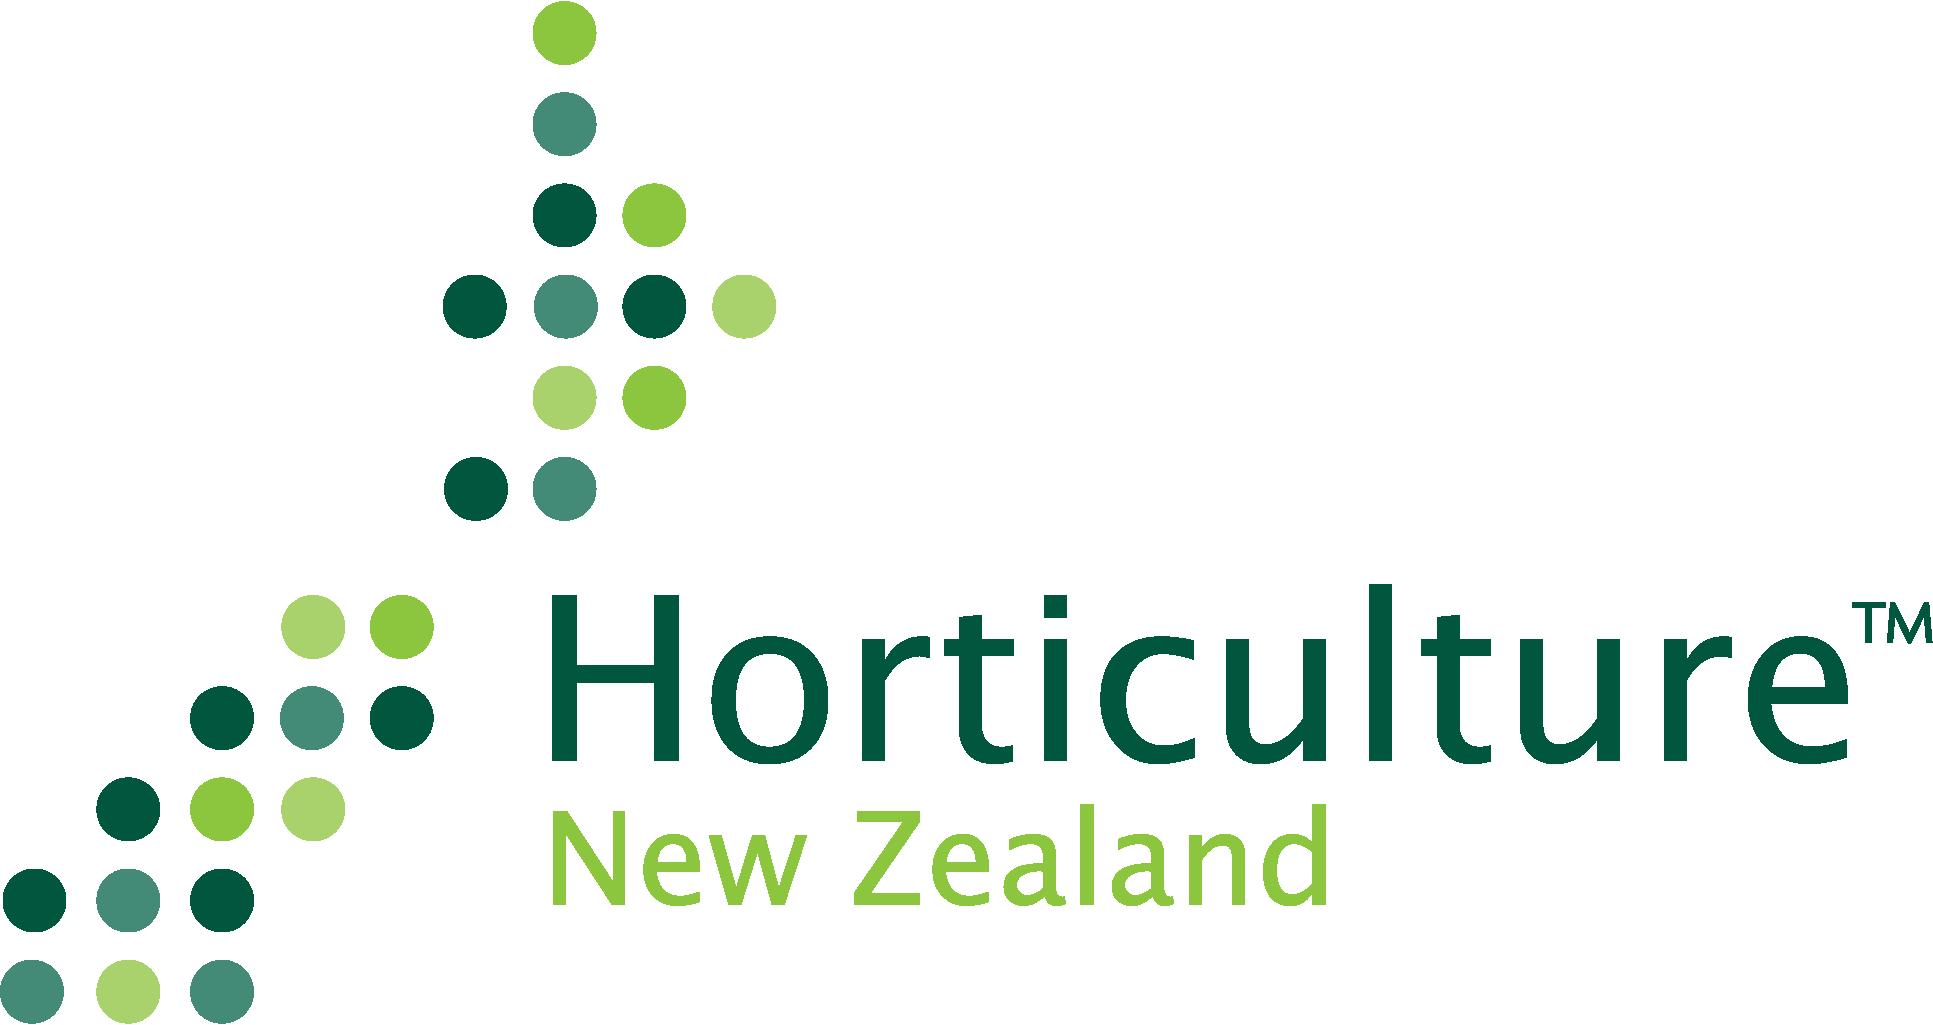 HortNZ_vector-376_343.png